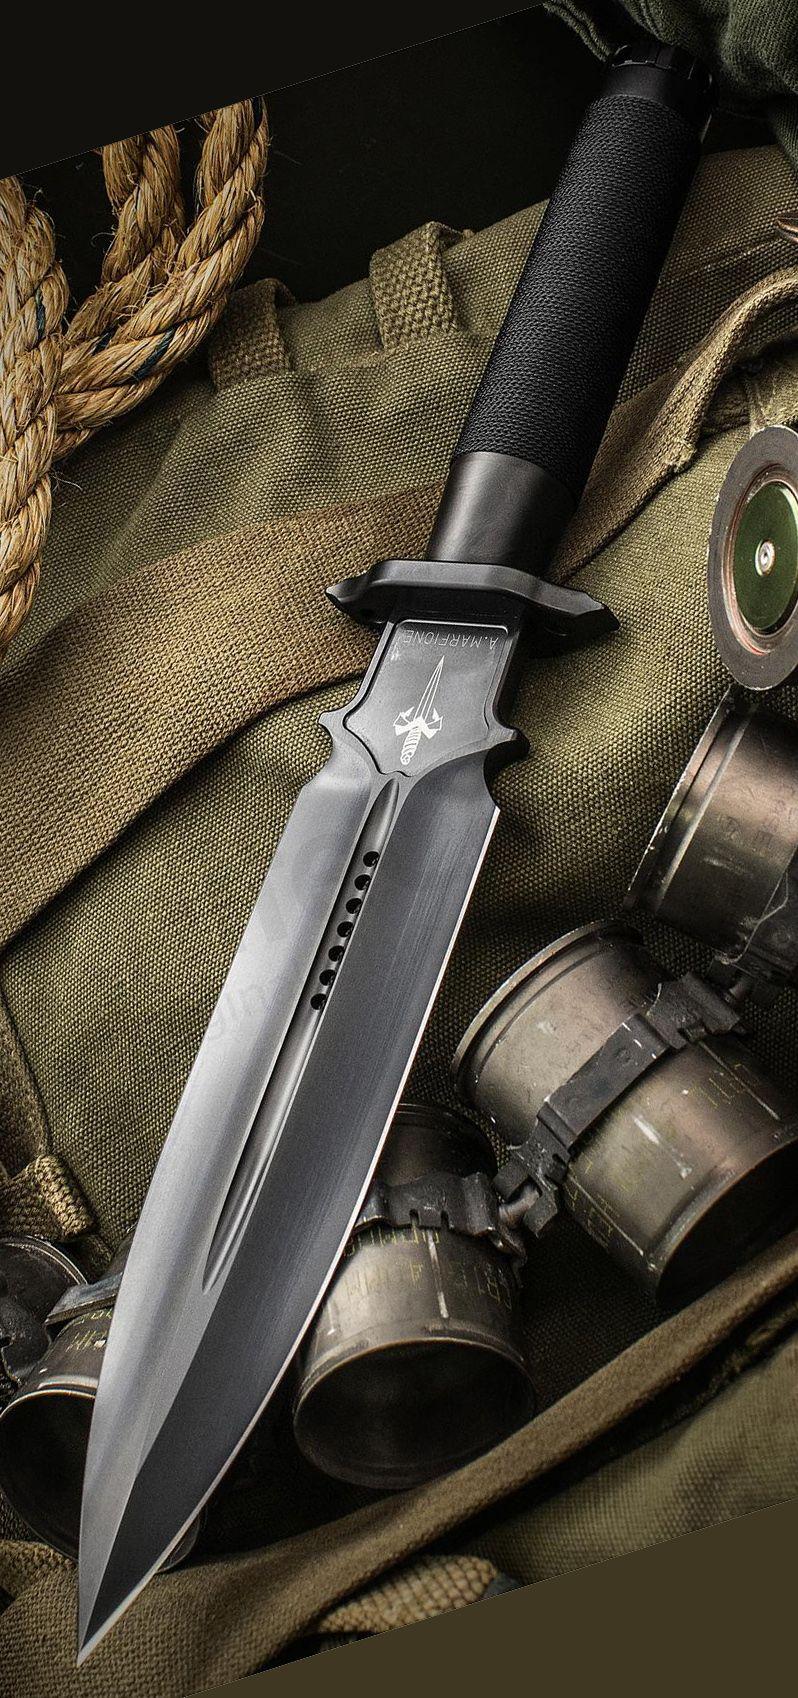 Marfione Custom Knives Interceptor Survival Knife Black